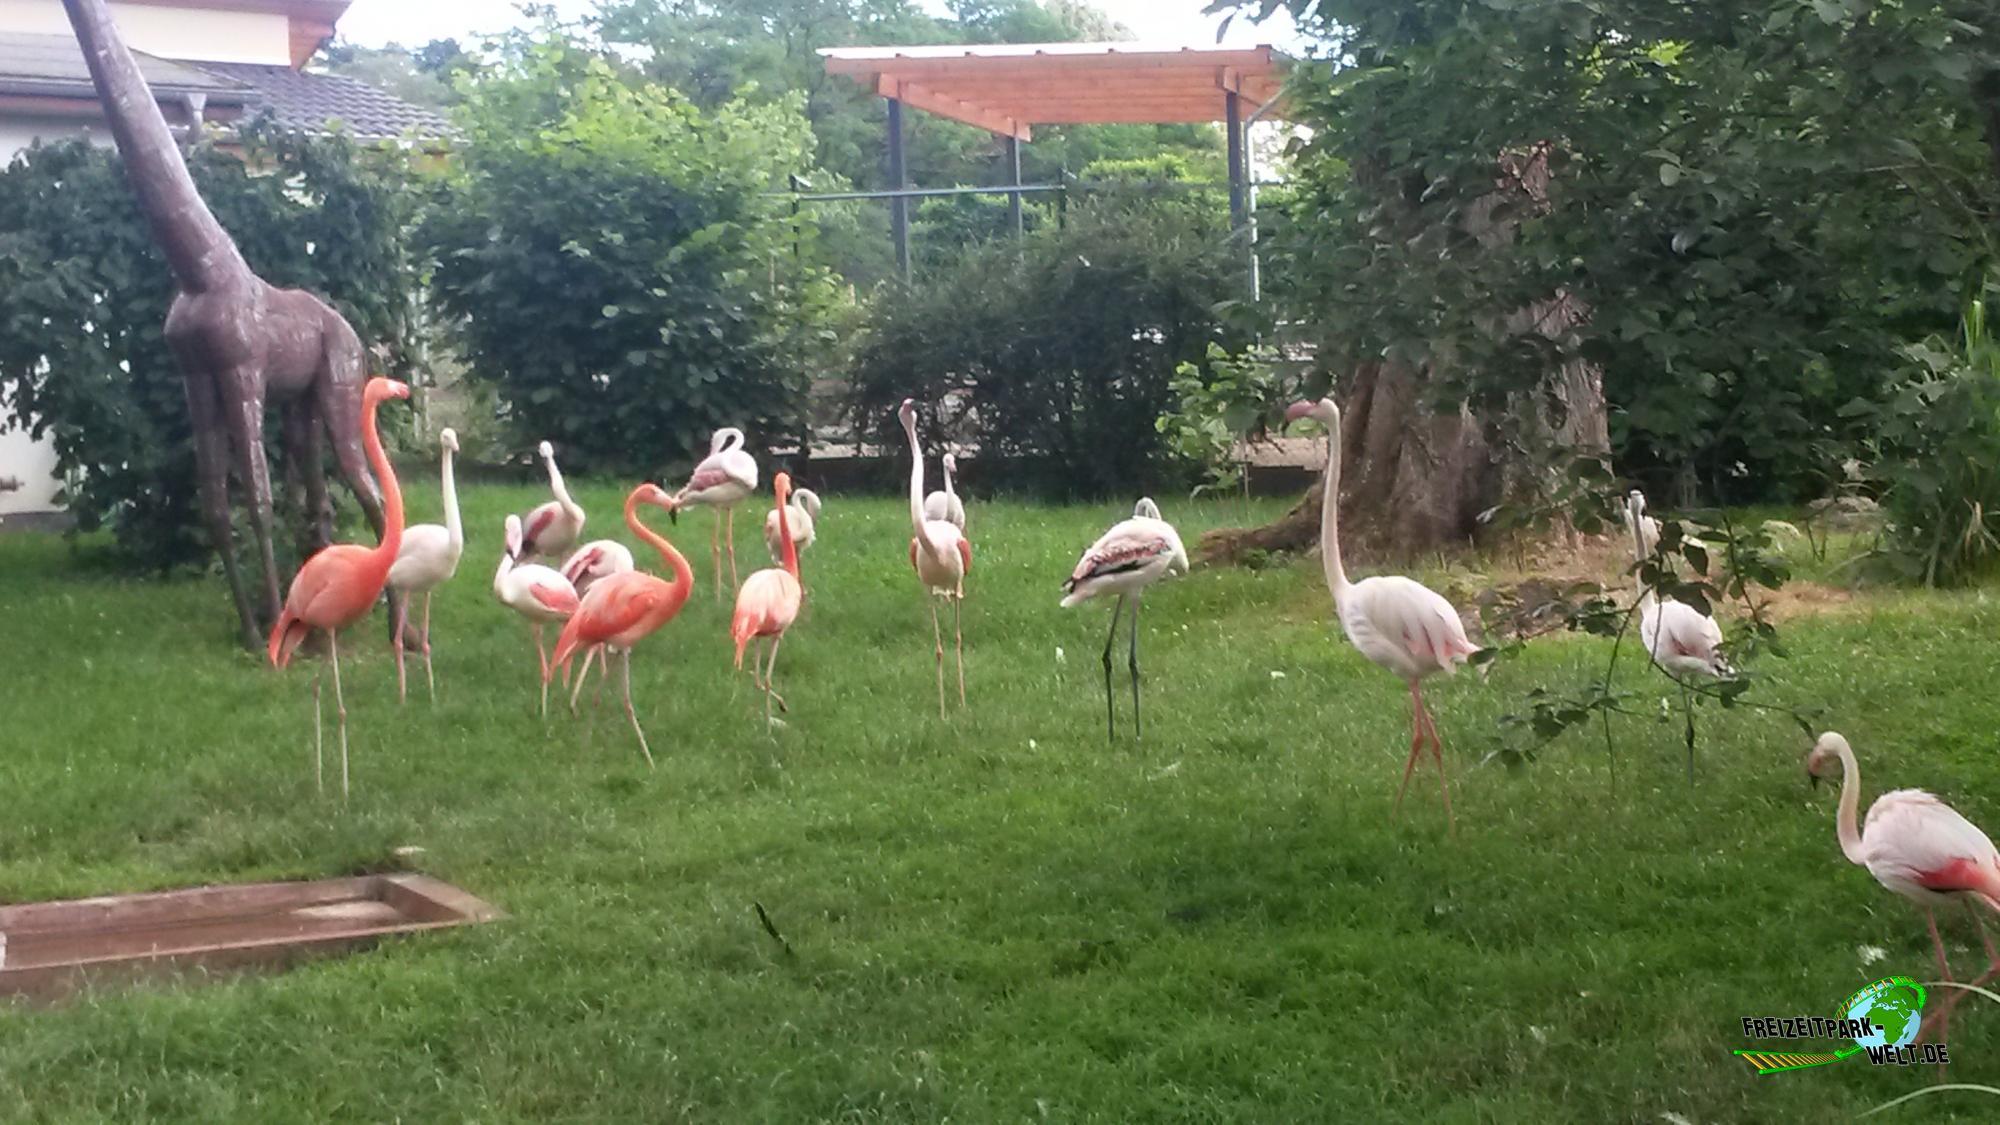 chile flamingo zoo neuwied freizeitpark. Black Bedroom Furniture Sets. Home Design Ideas